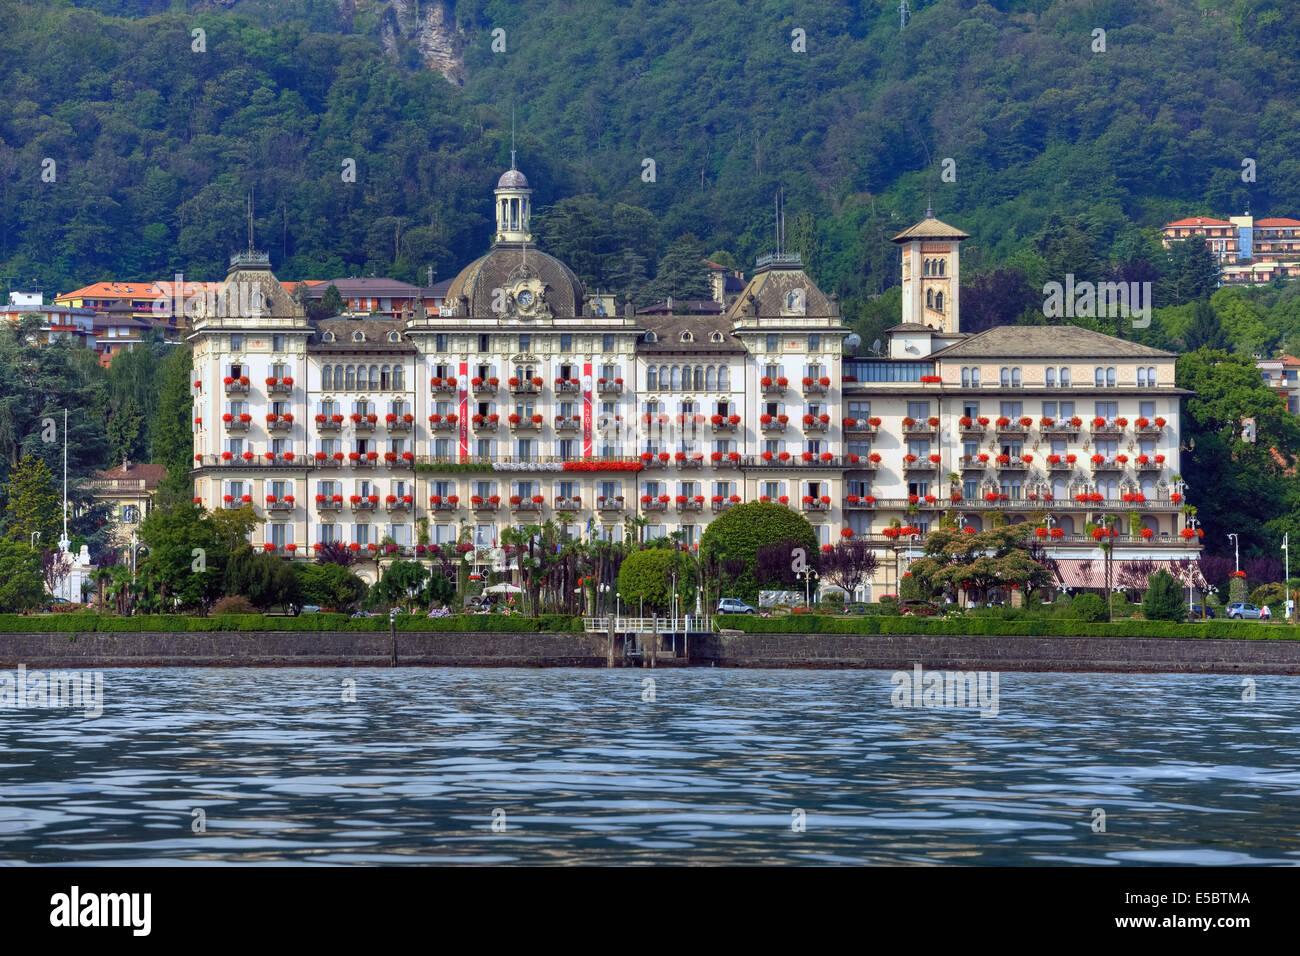 Grand Hotel des Iles Borromées, Stresa, Piedmont, Italy - Stock Image